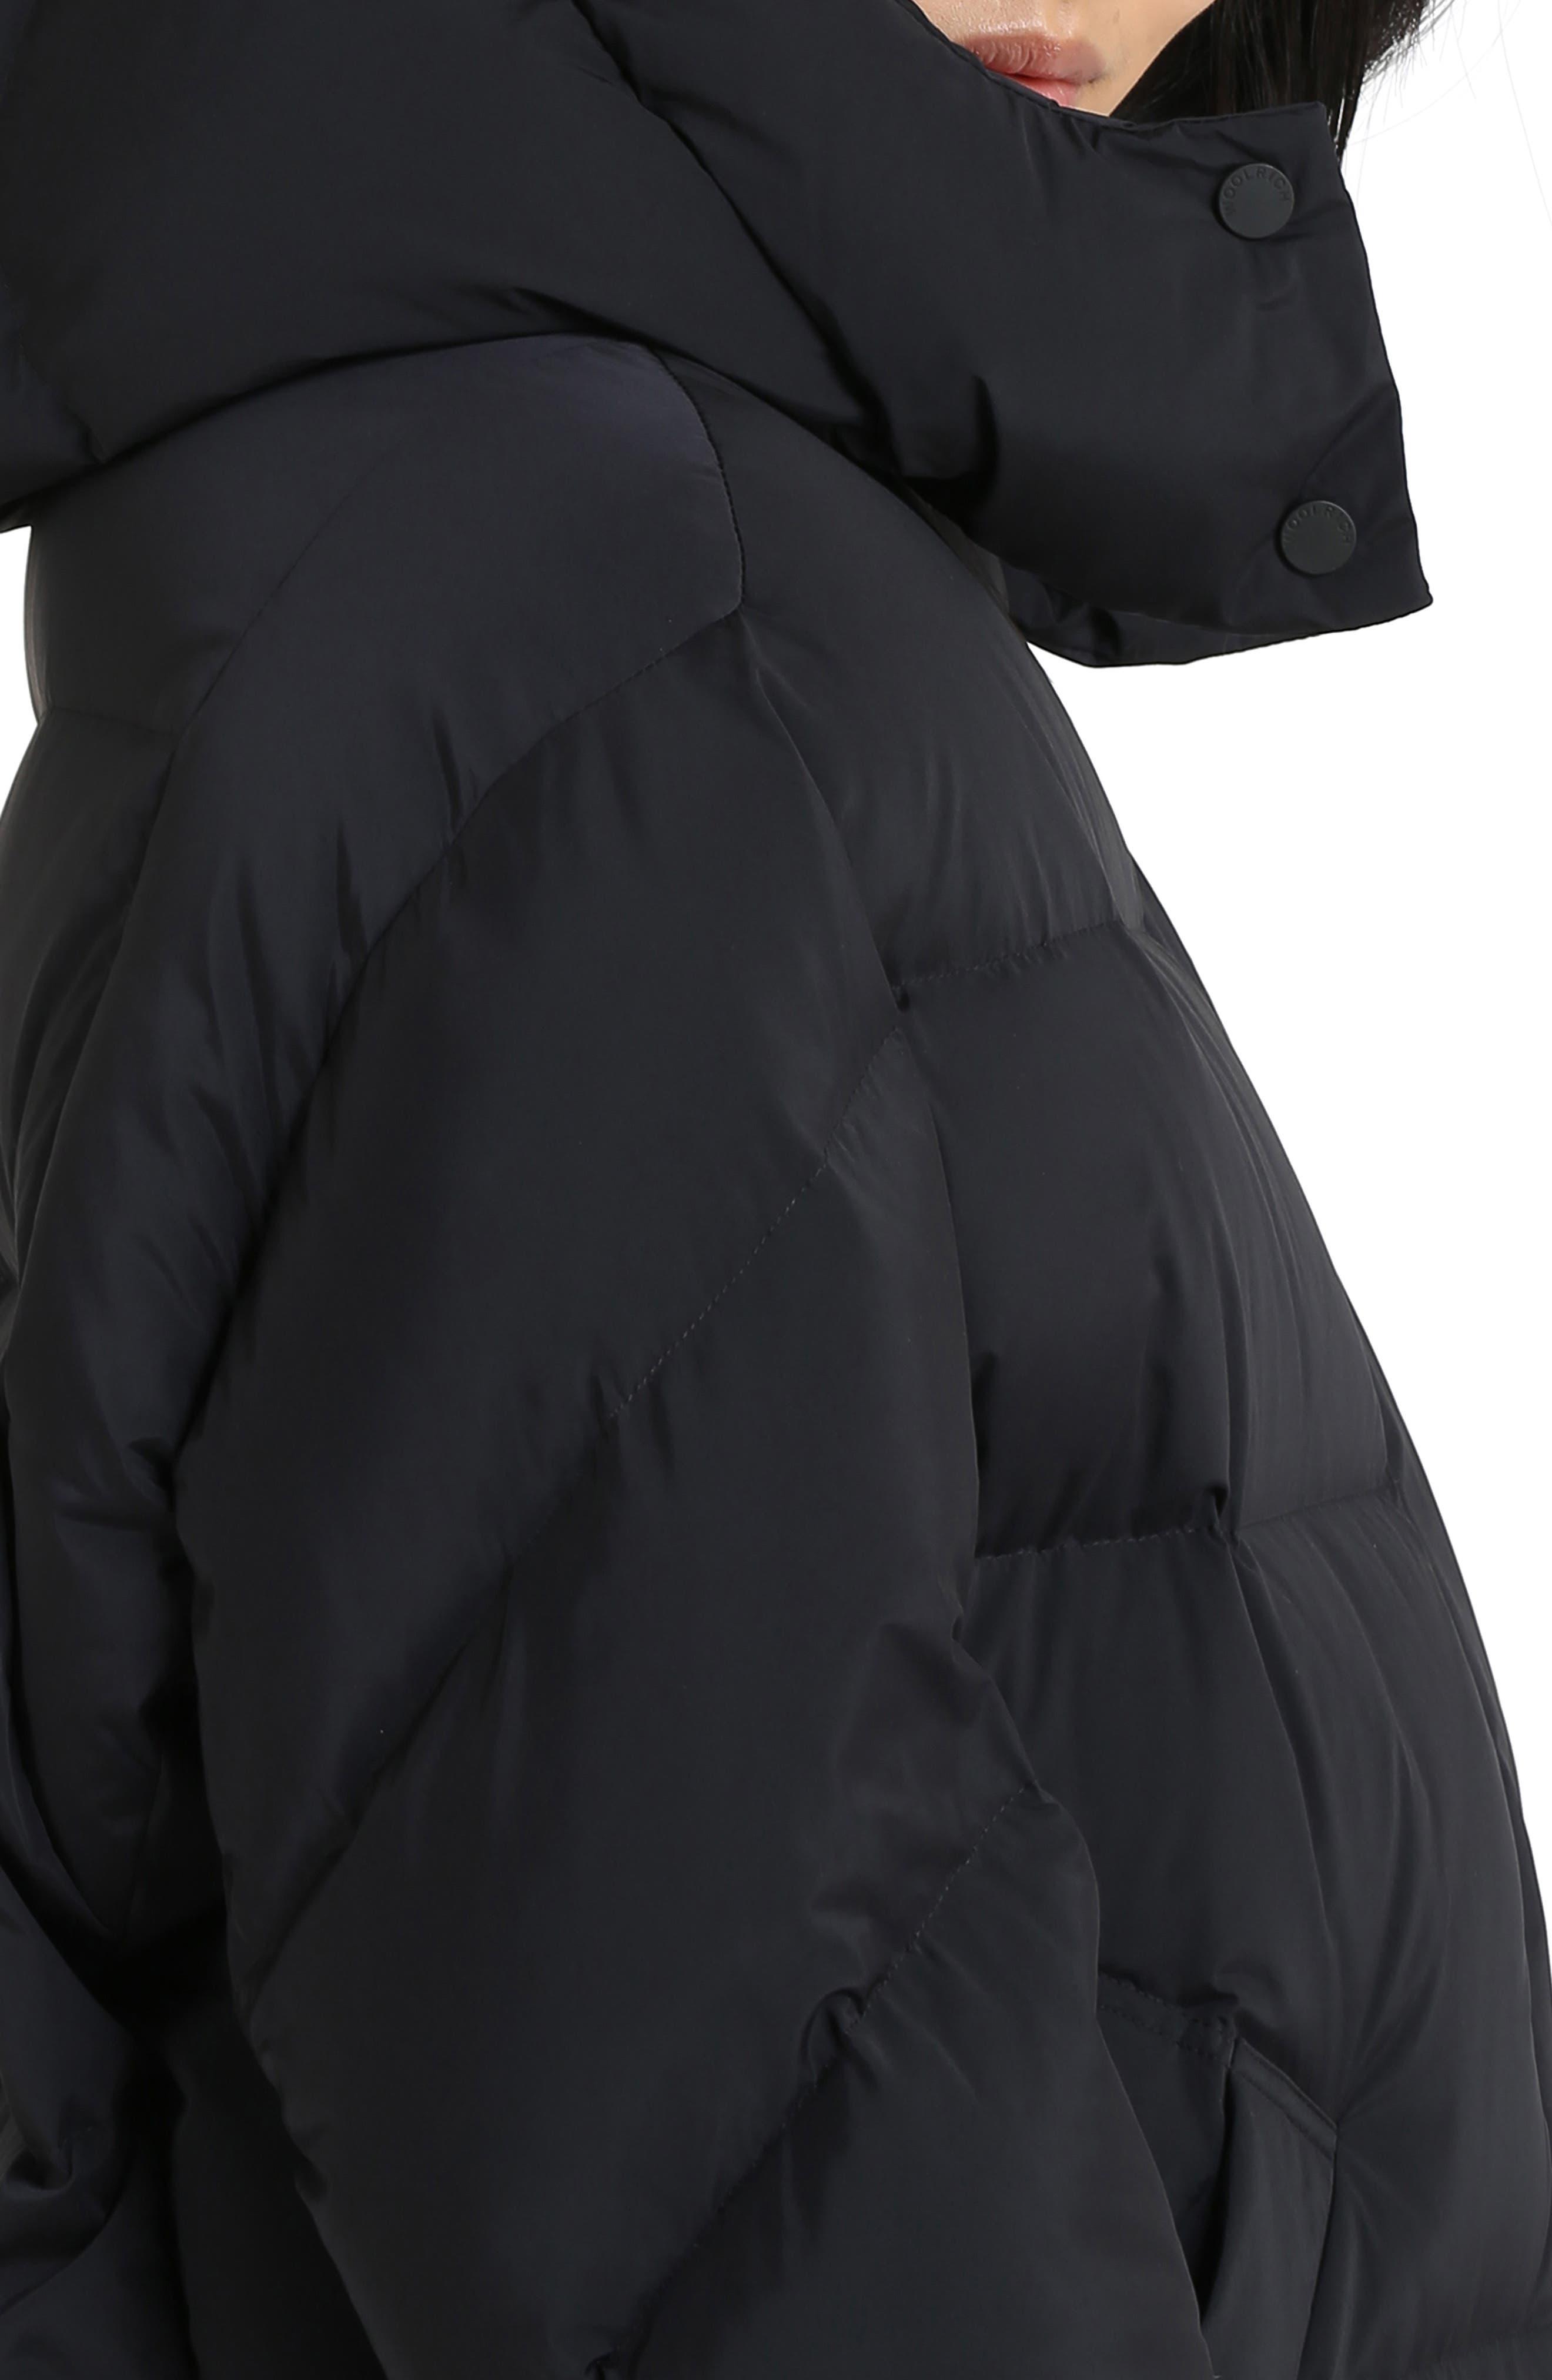 Aurora Water Repellent Puffy Down Coat,                             Alternate thumbnail 3, color,                             BLACK